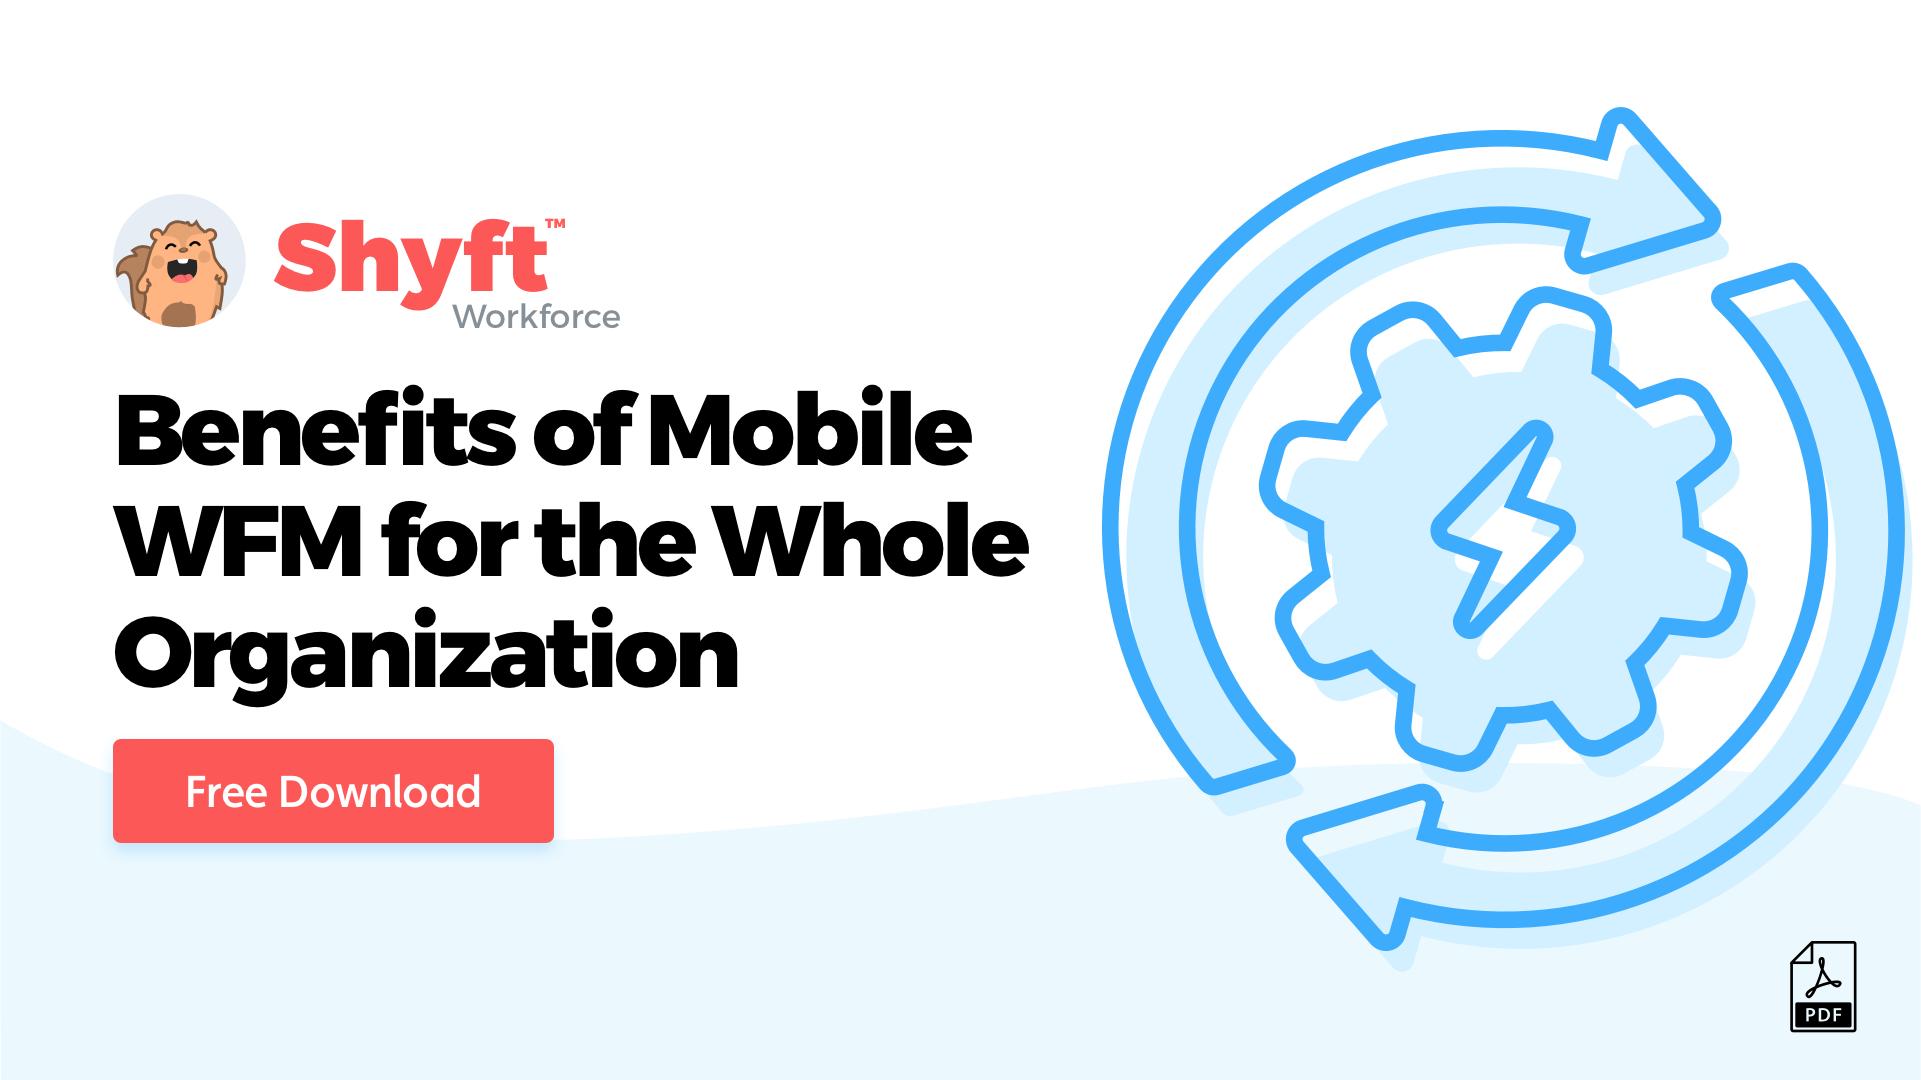 benefits-of-WFM-for-organization